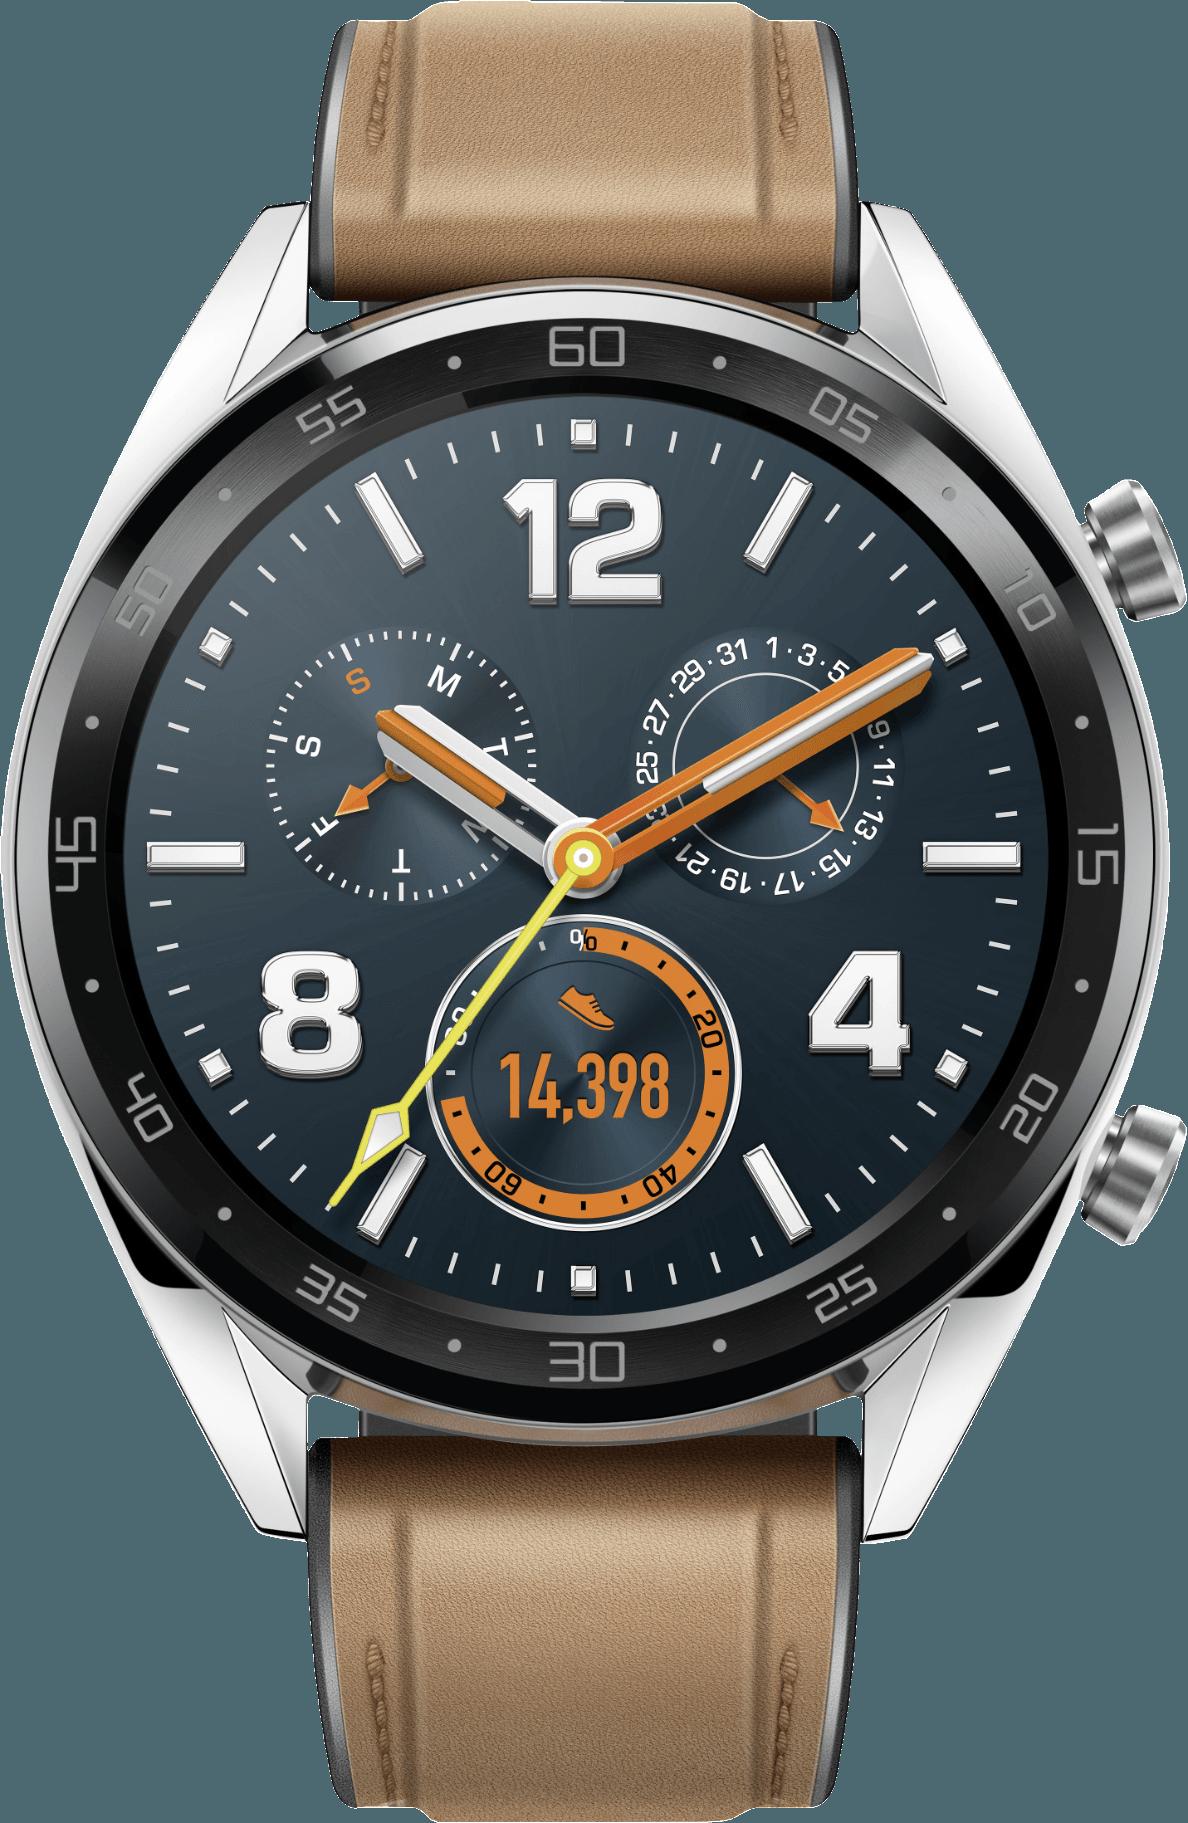 Huawei Watch Gt Smartwatch Kaufen Armband Silikon 140 210 Mm Farbe Saddle Brown 06901443262588 Jederzeit Startk Smartwatch Notebook Kaufen Sport Armband